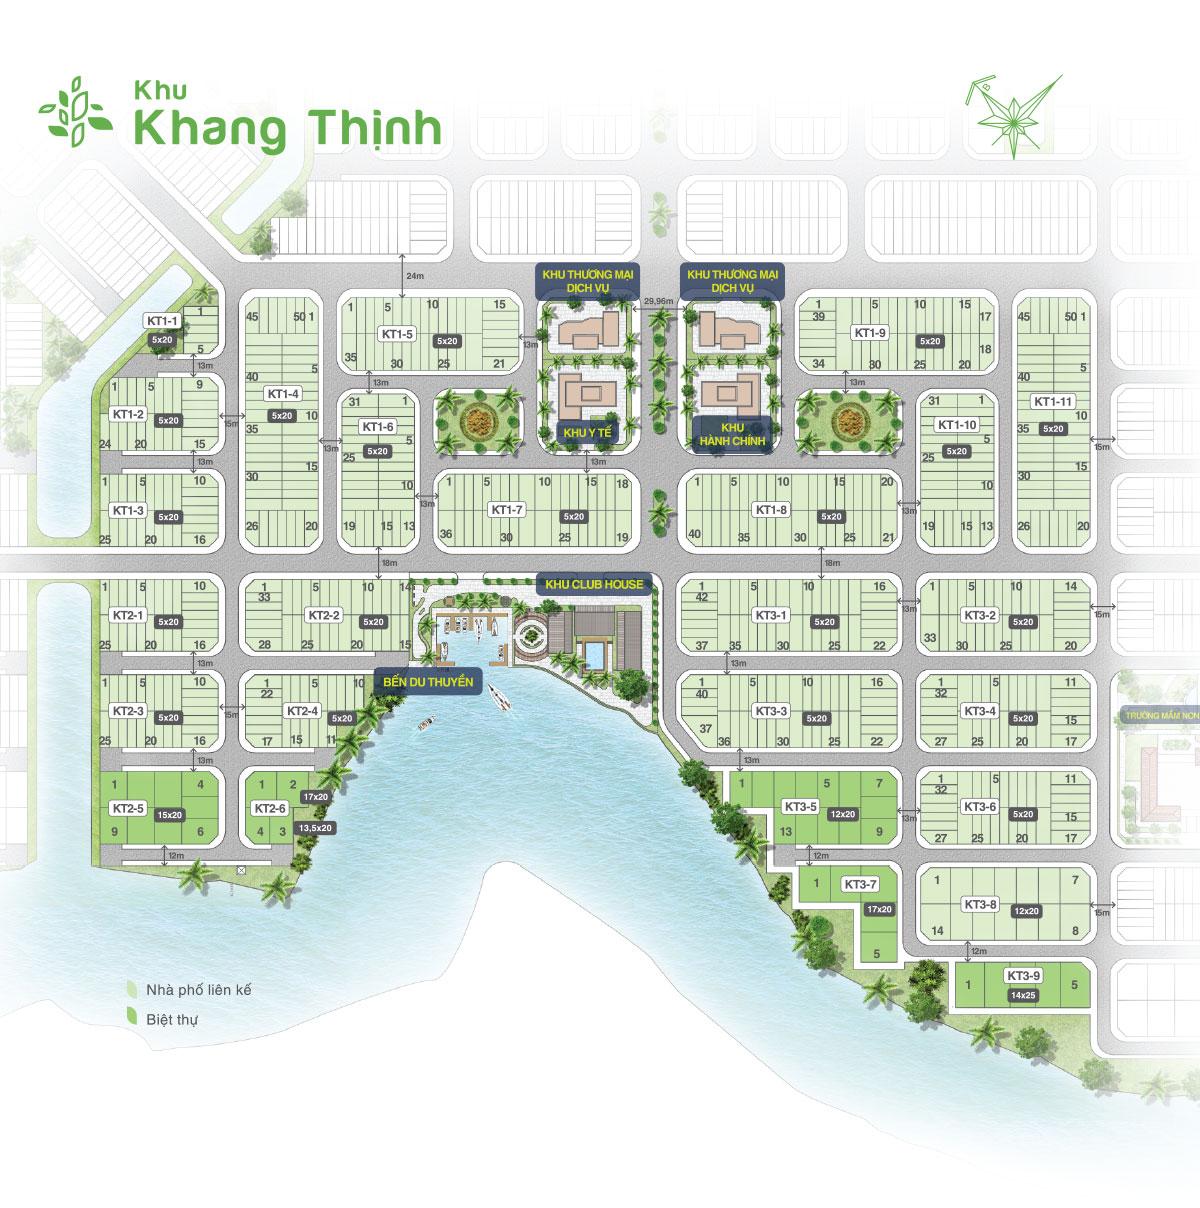 khang_thinh